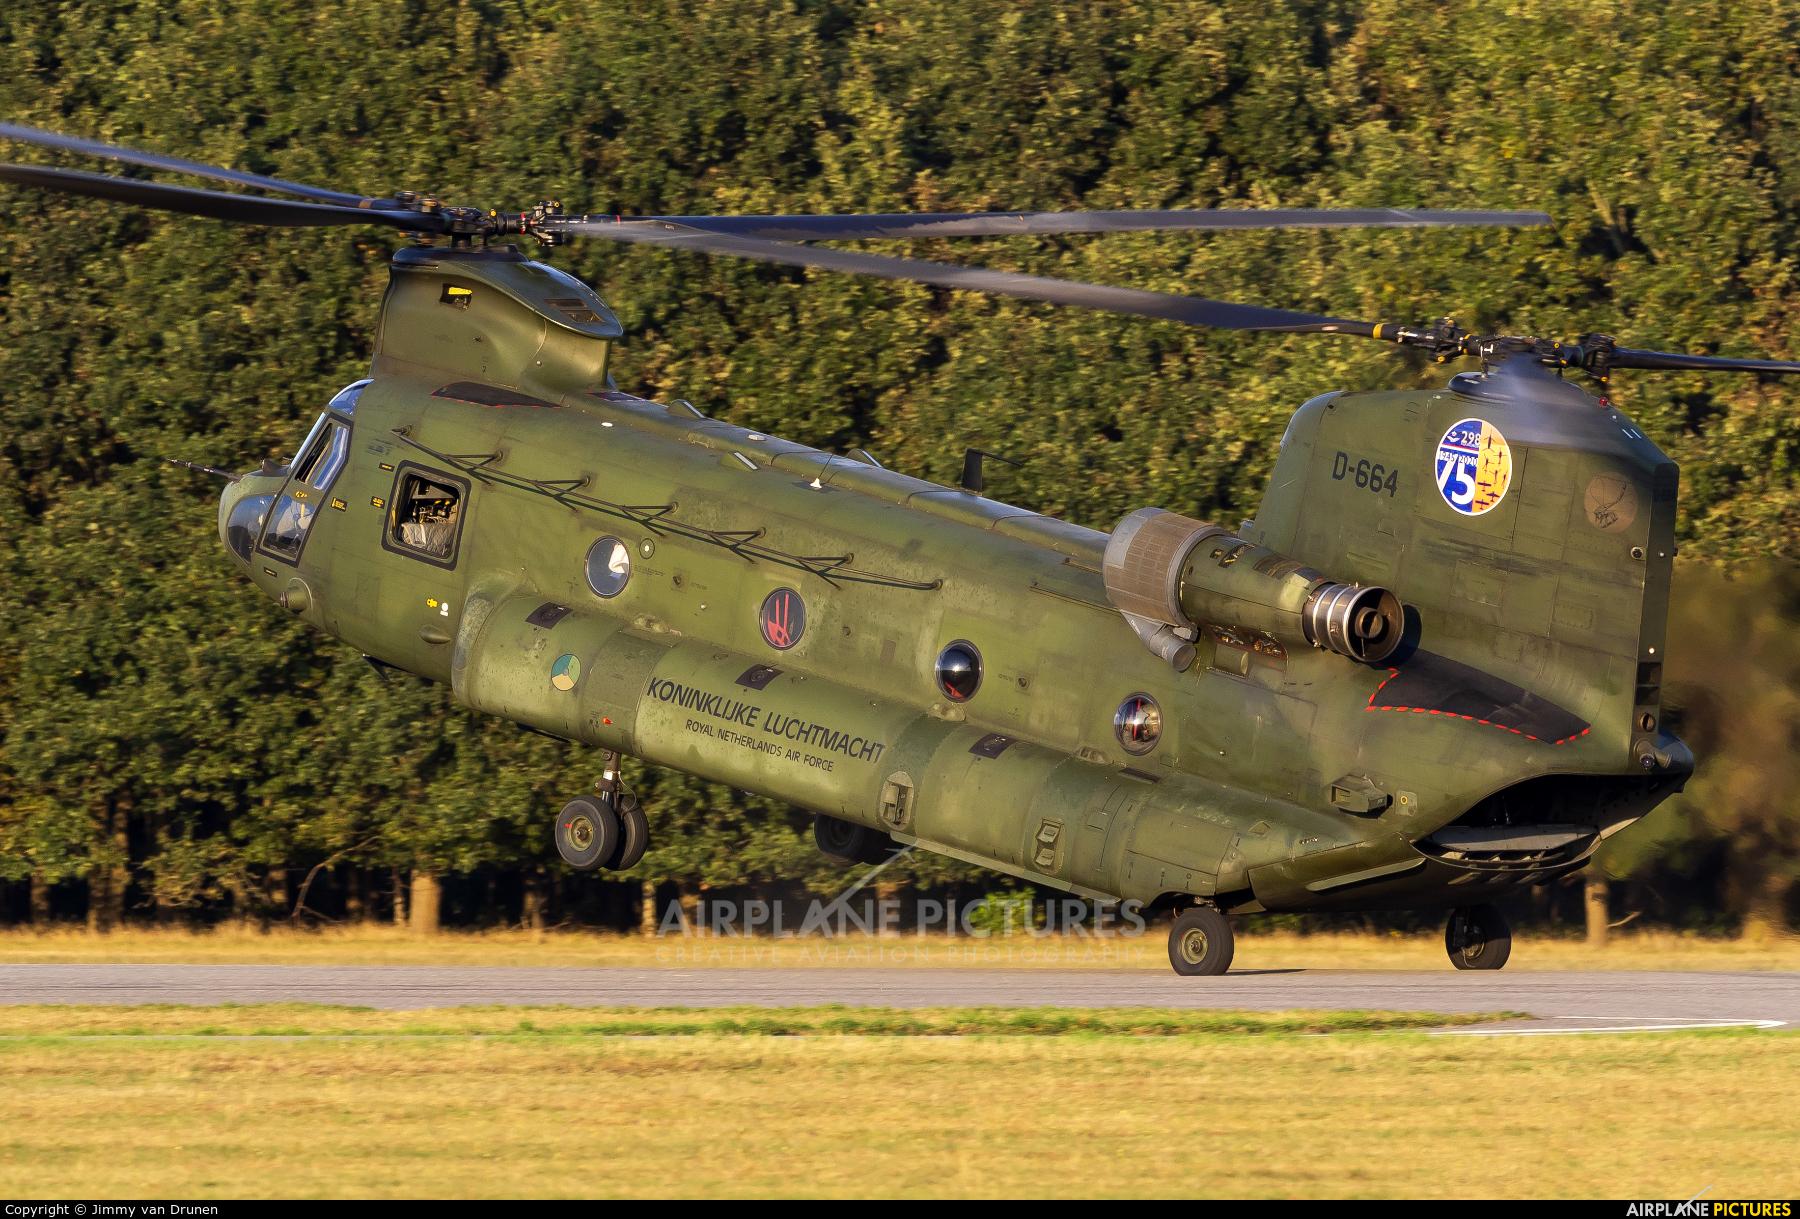 Netherlands - Air Force D-664 aircraft at Gilze-Rijen